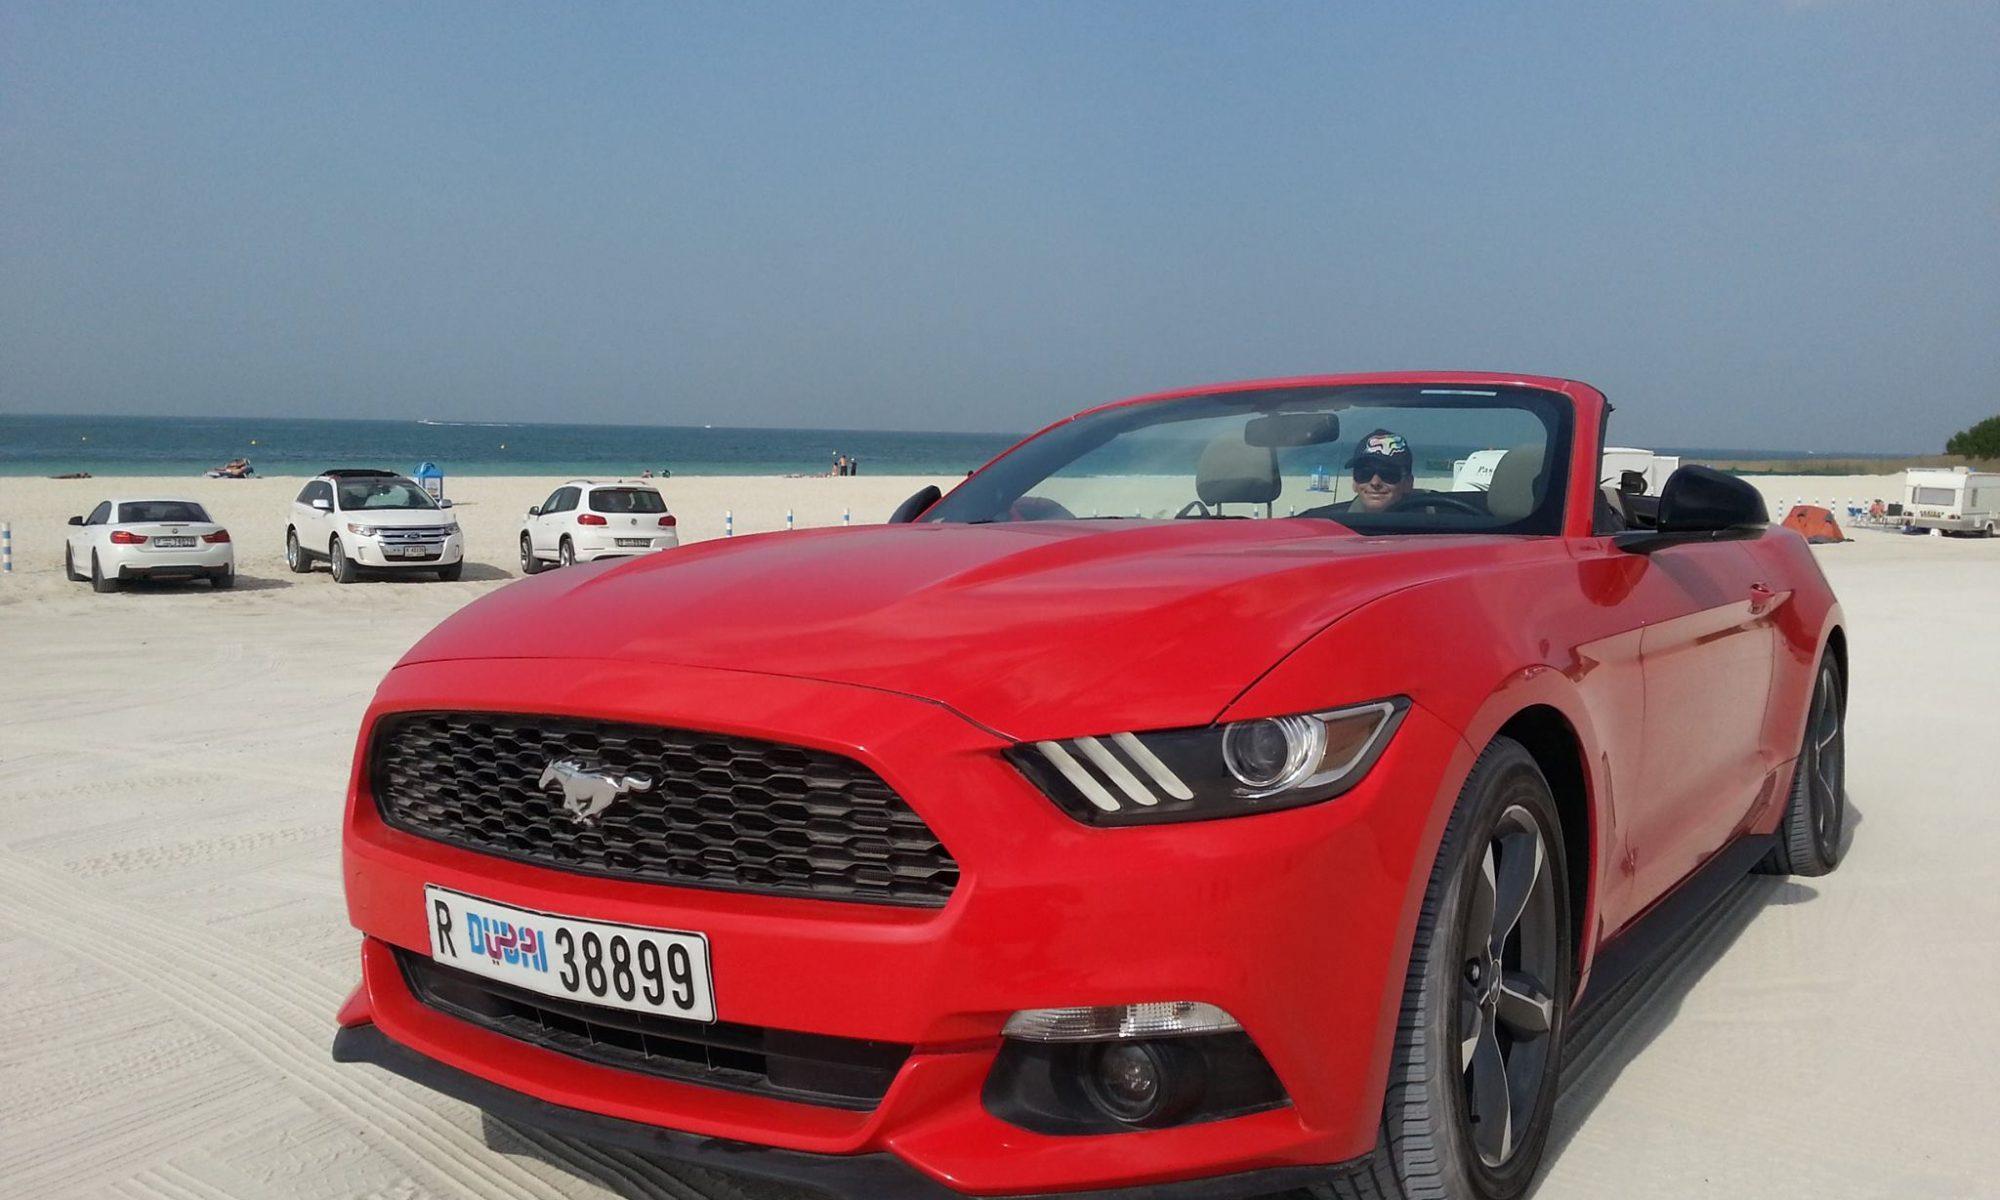 American Cars Rental Bratislava Mustang Cabrio